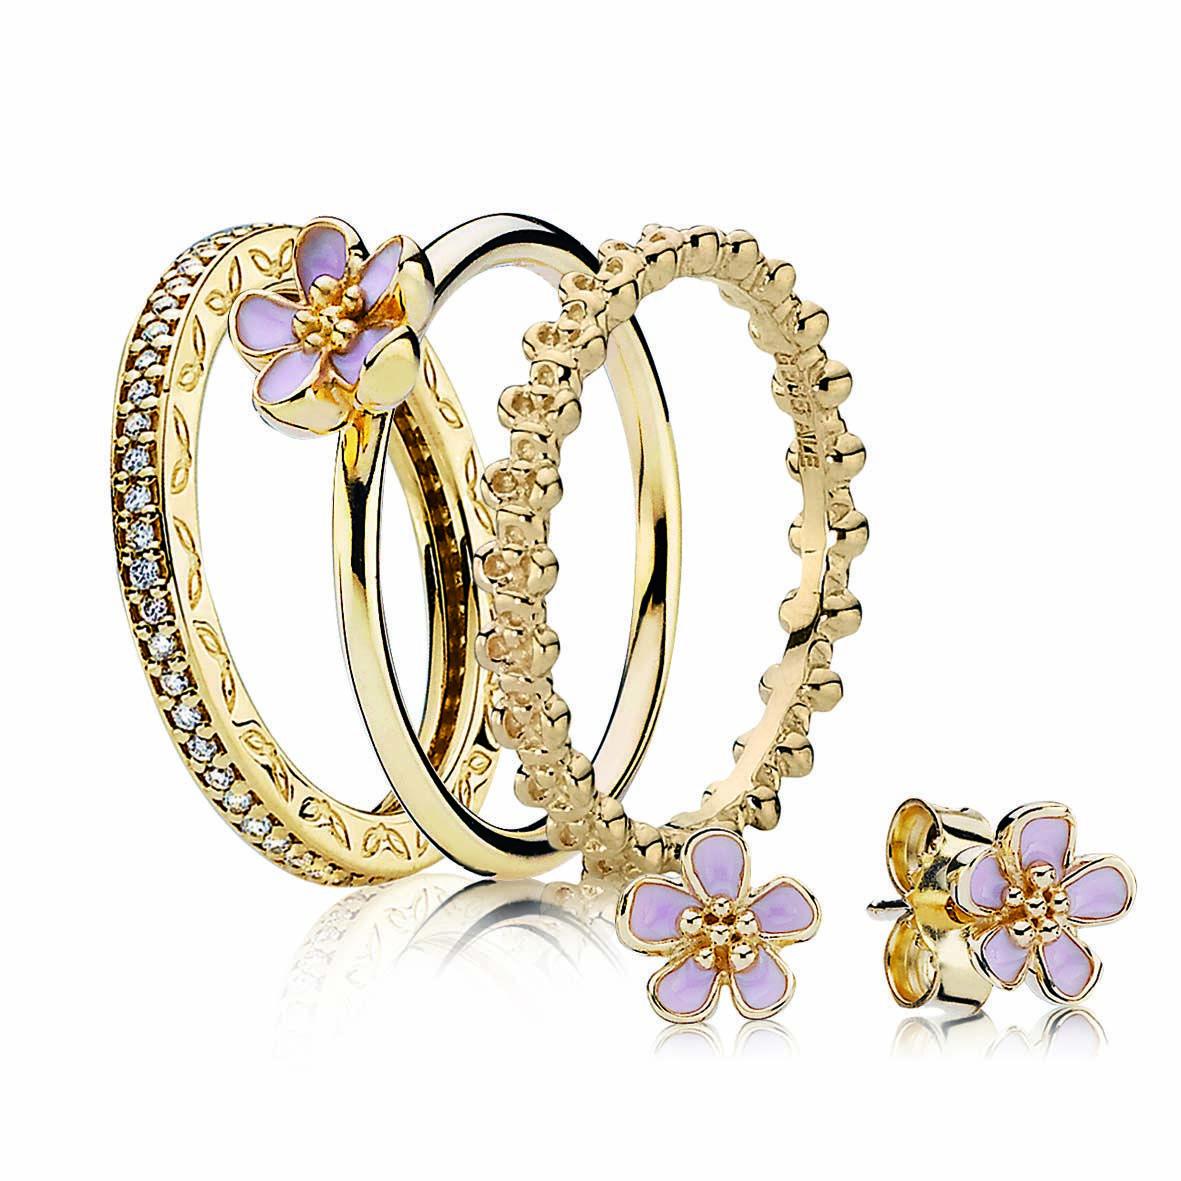 Our New Season Picks From PANDORA -  PANDORA gold channel set diamond ring $1,499, fine gold cherry blossom ring $349, fine gold floral  - #cuteoutfits #cuteweddingdress #fashionjewelry #fashiontrends #pandora #pandoracharms #pandorarings #Picks #Season #trendyoutfits #weddingbride